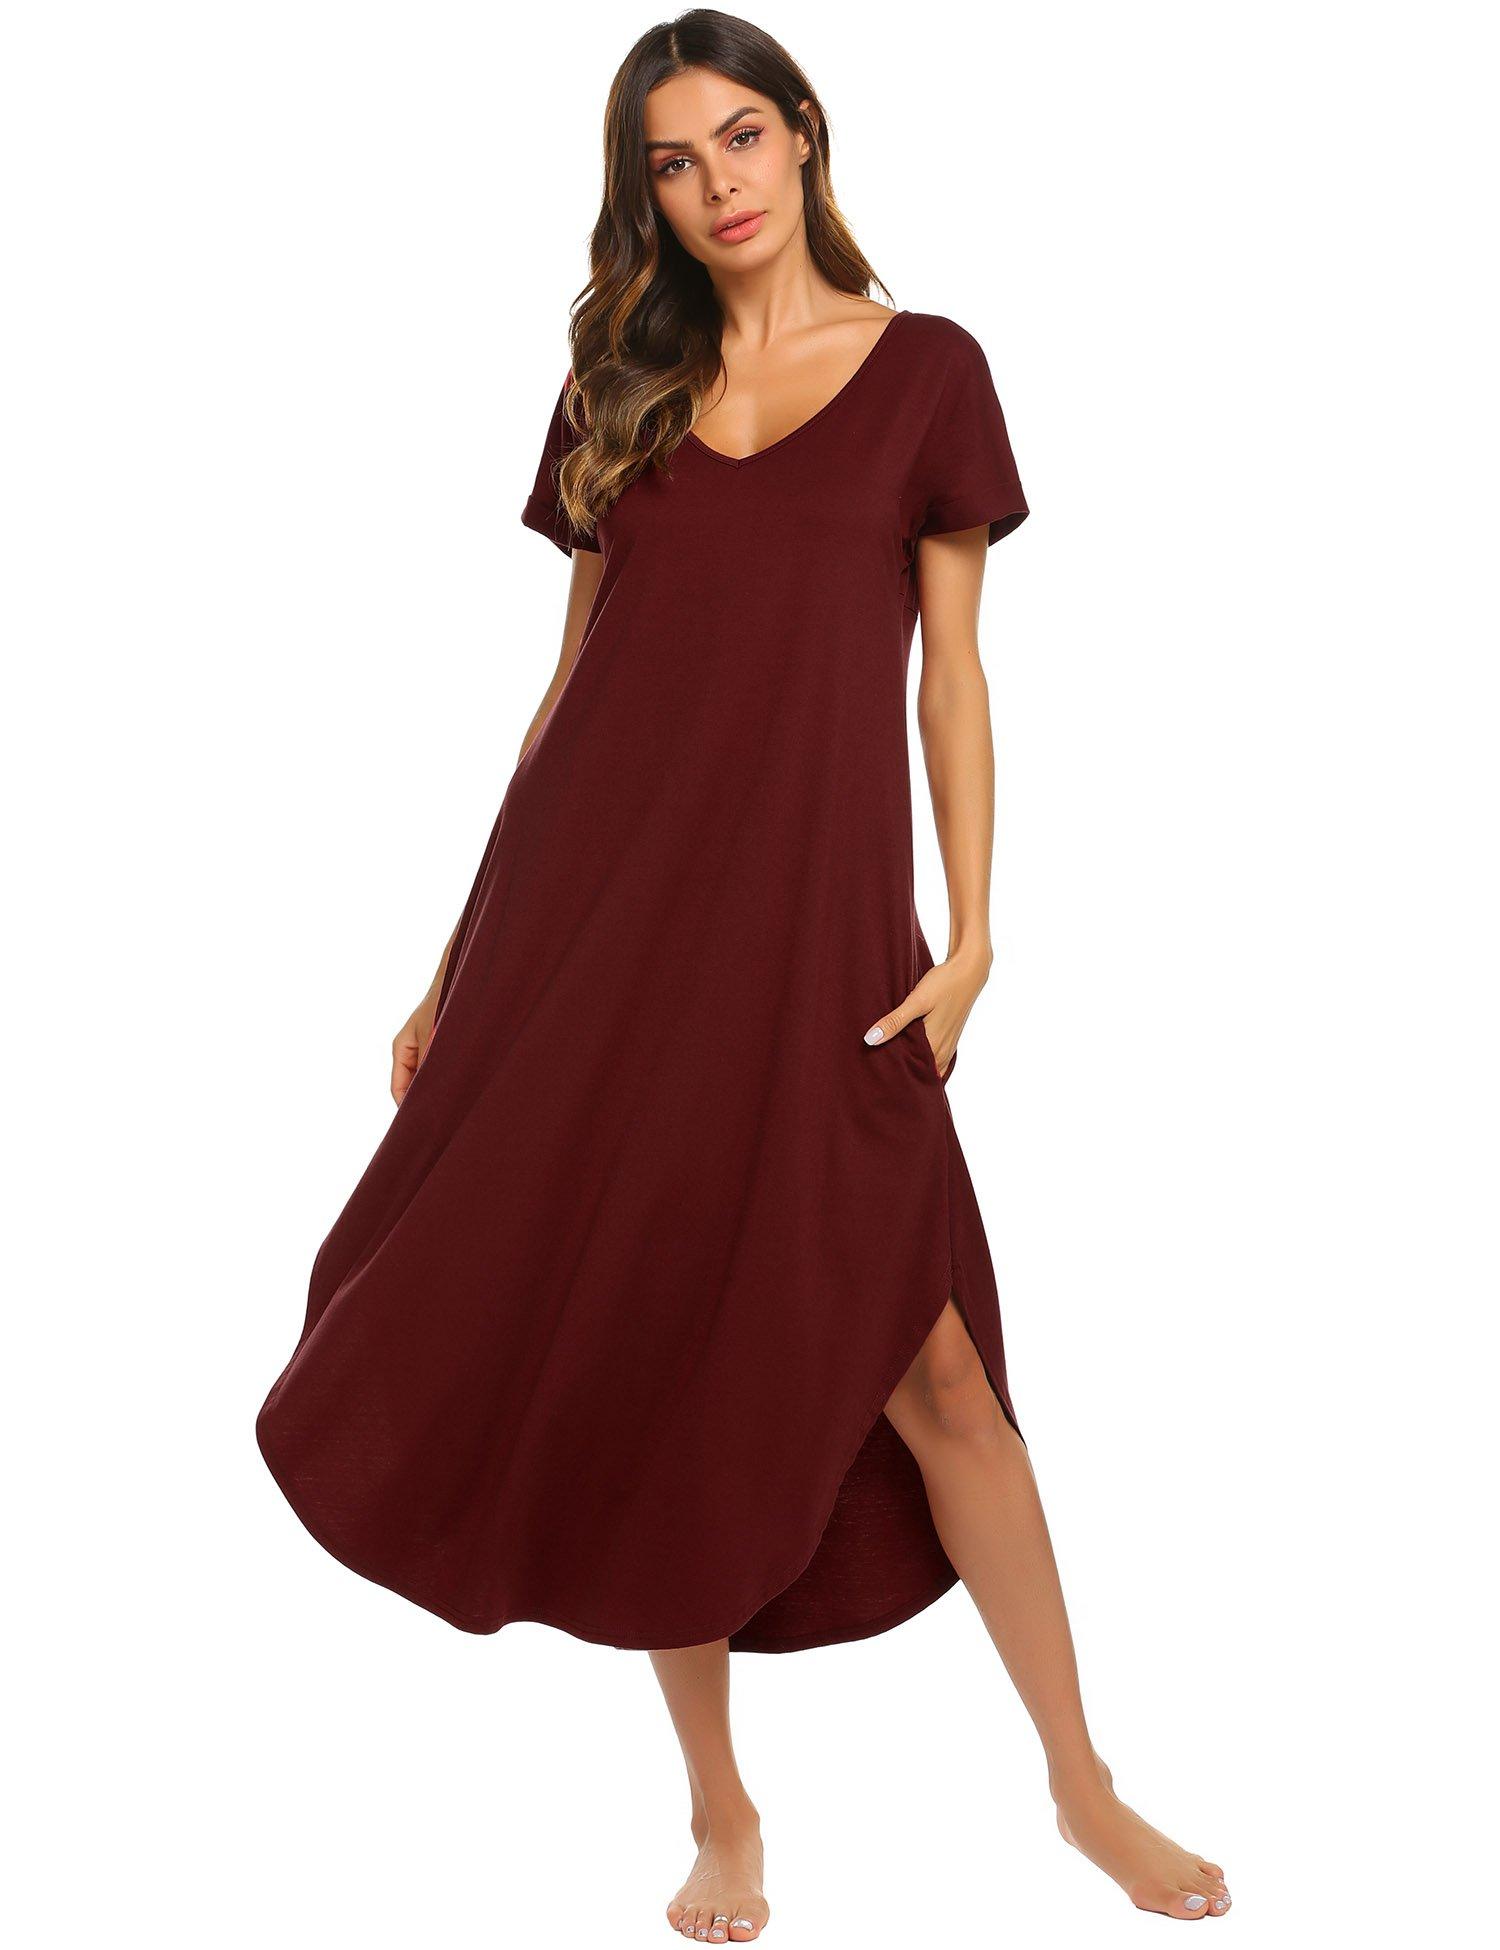 Ekouaer Plus Size Nightshirt Women's Short Sleeve Sleep Gown Soft Long Nighty Dress (Wine Red,XXL)